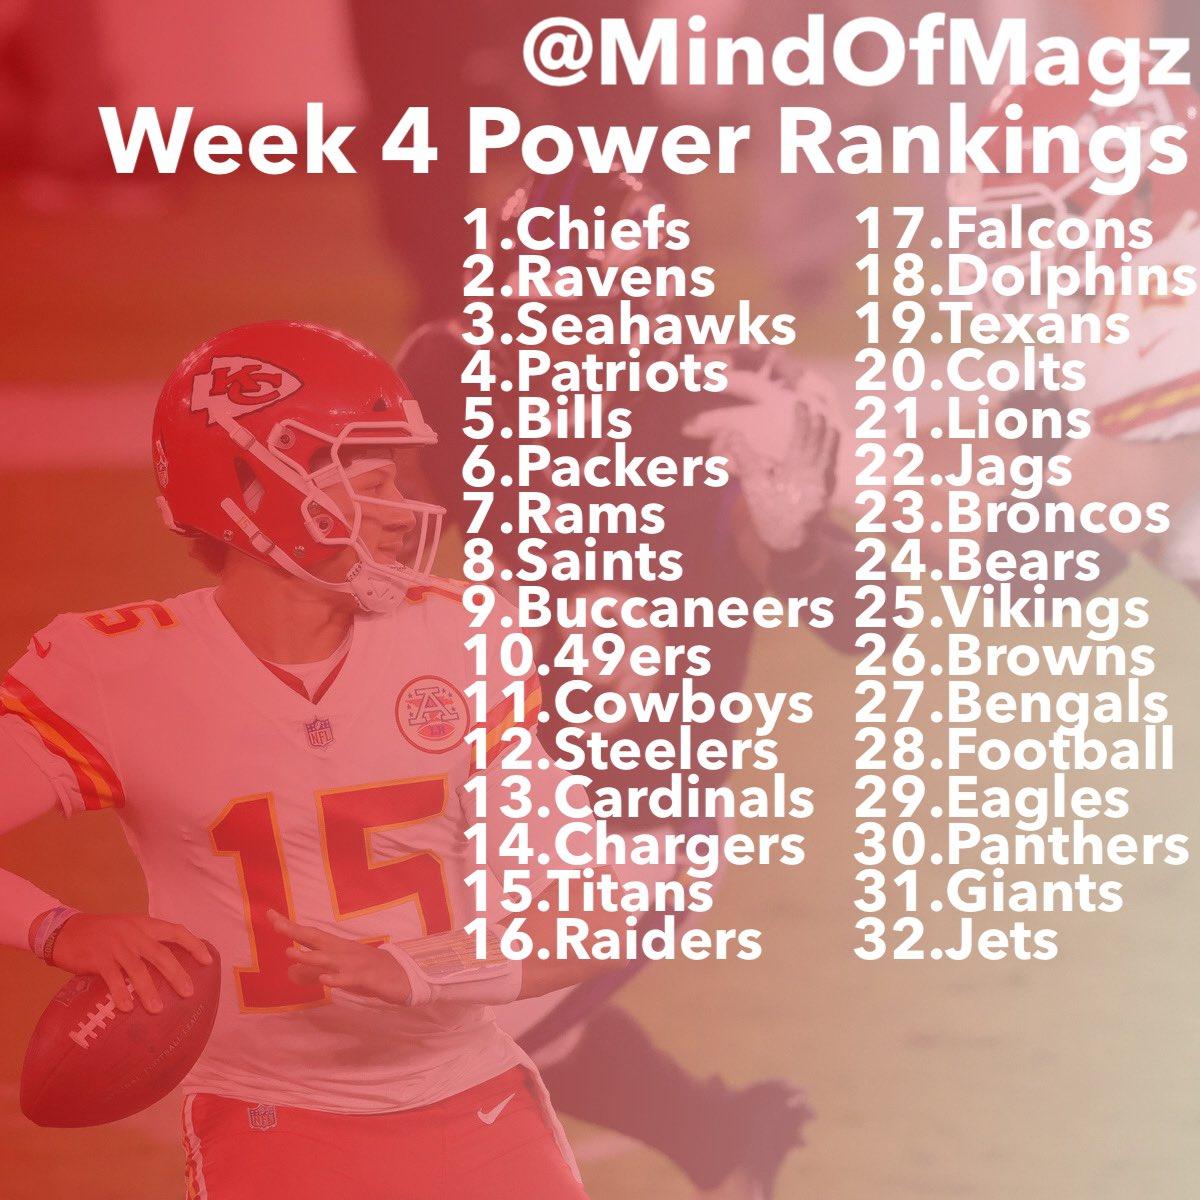 My #NFL Week 4 Power Rankings https://t.co/HAKVjgrNyO